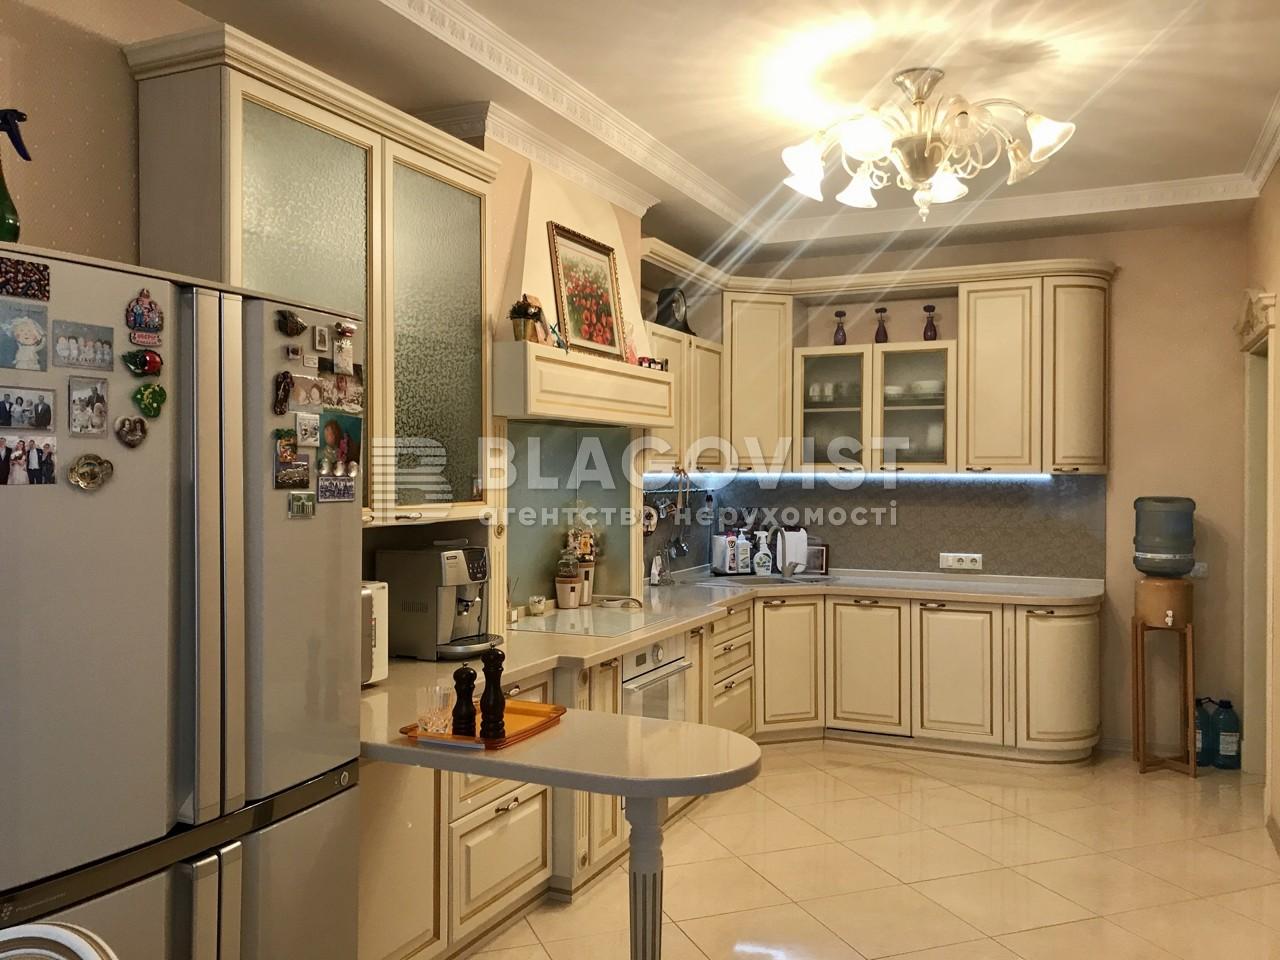 Квартира F-42604, Мельникова, 18б, Киев - Фото 13